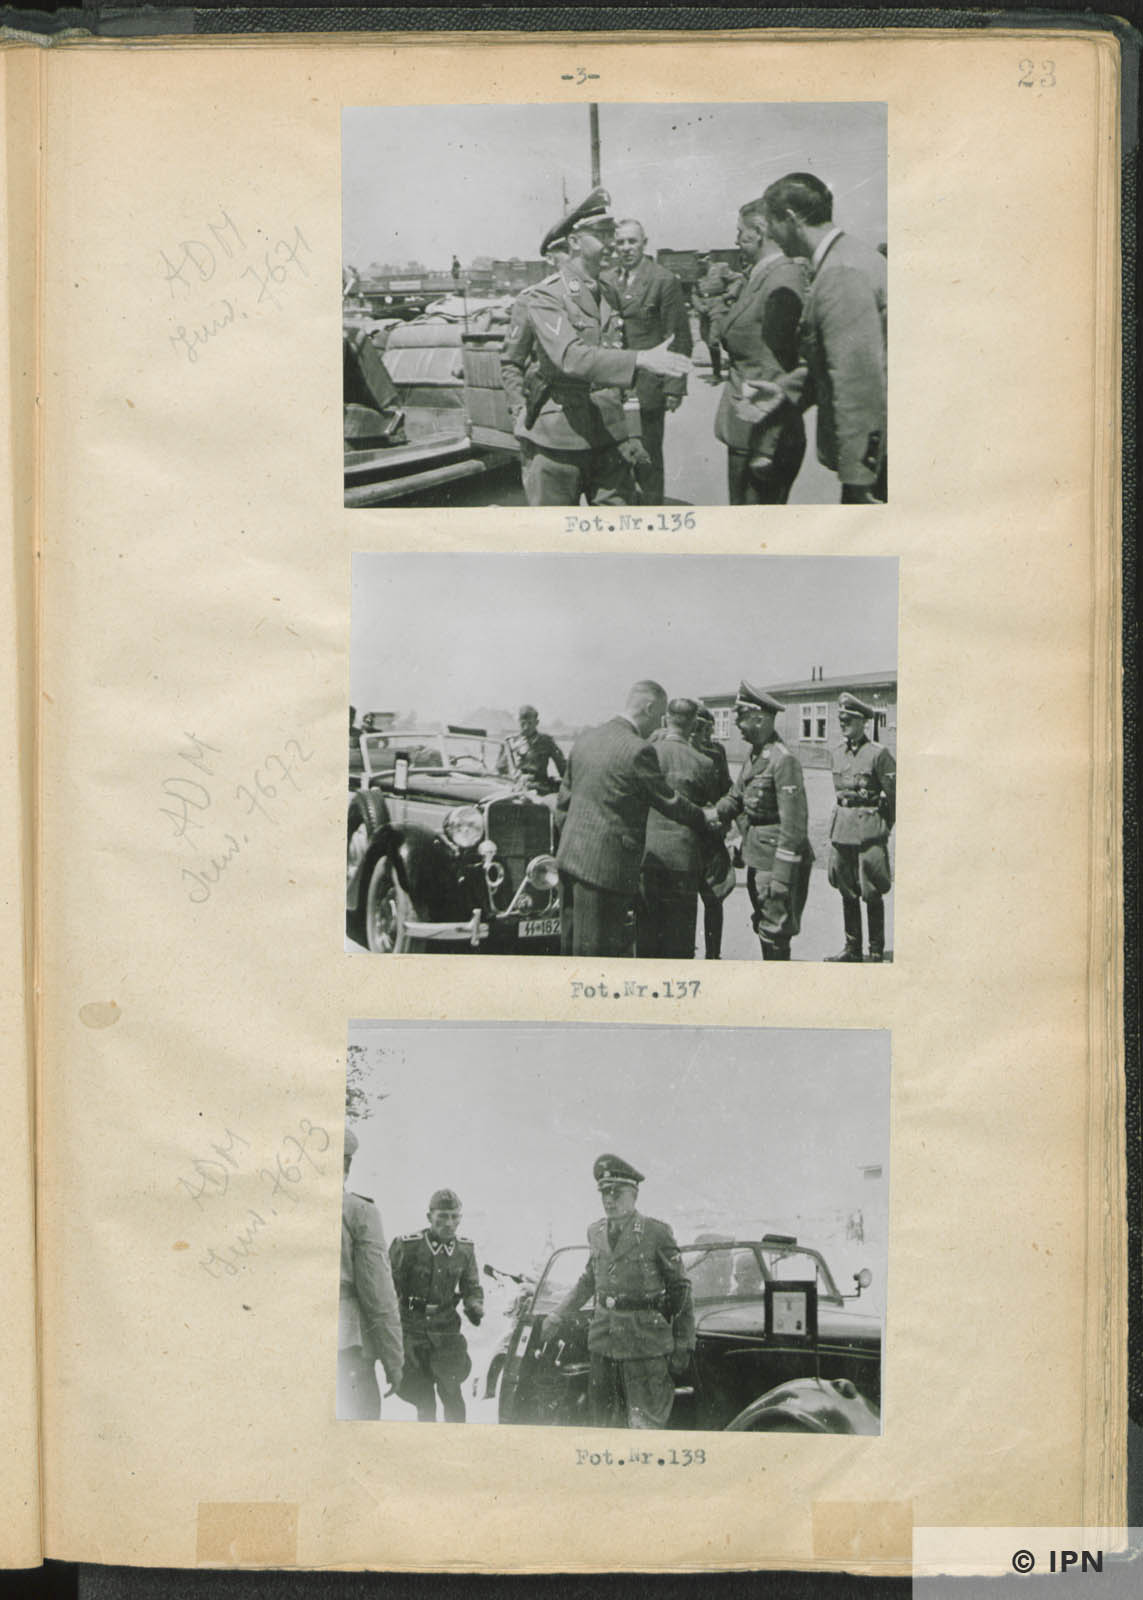 SS Reichsführer Heinrich Himmler visits IG Farben plant at Monowice. July 17 to 18 1942. IPN GK 196 97 0028